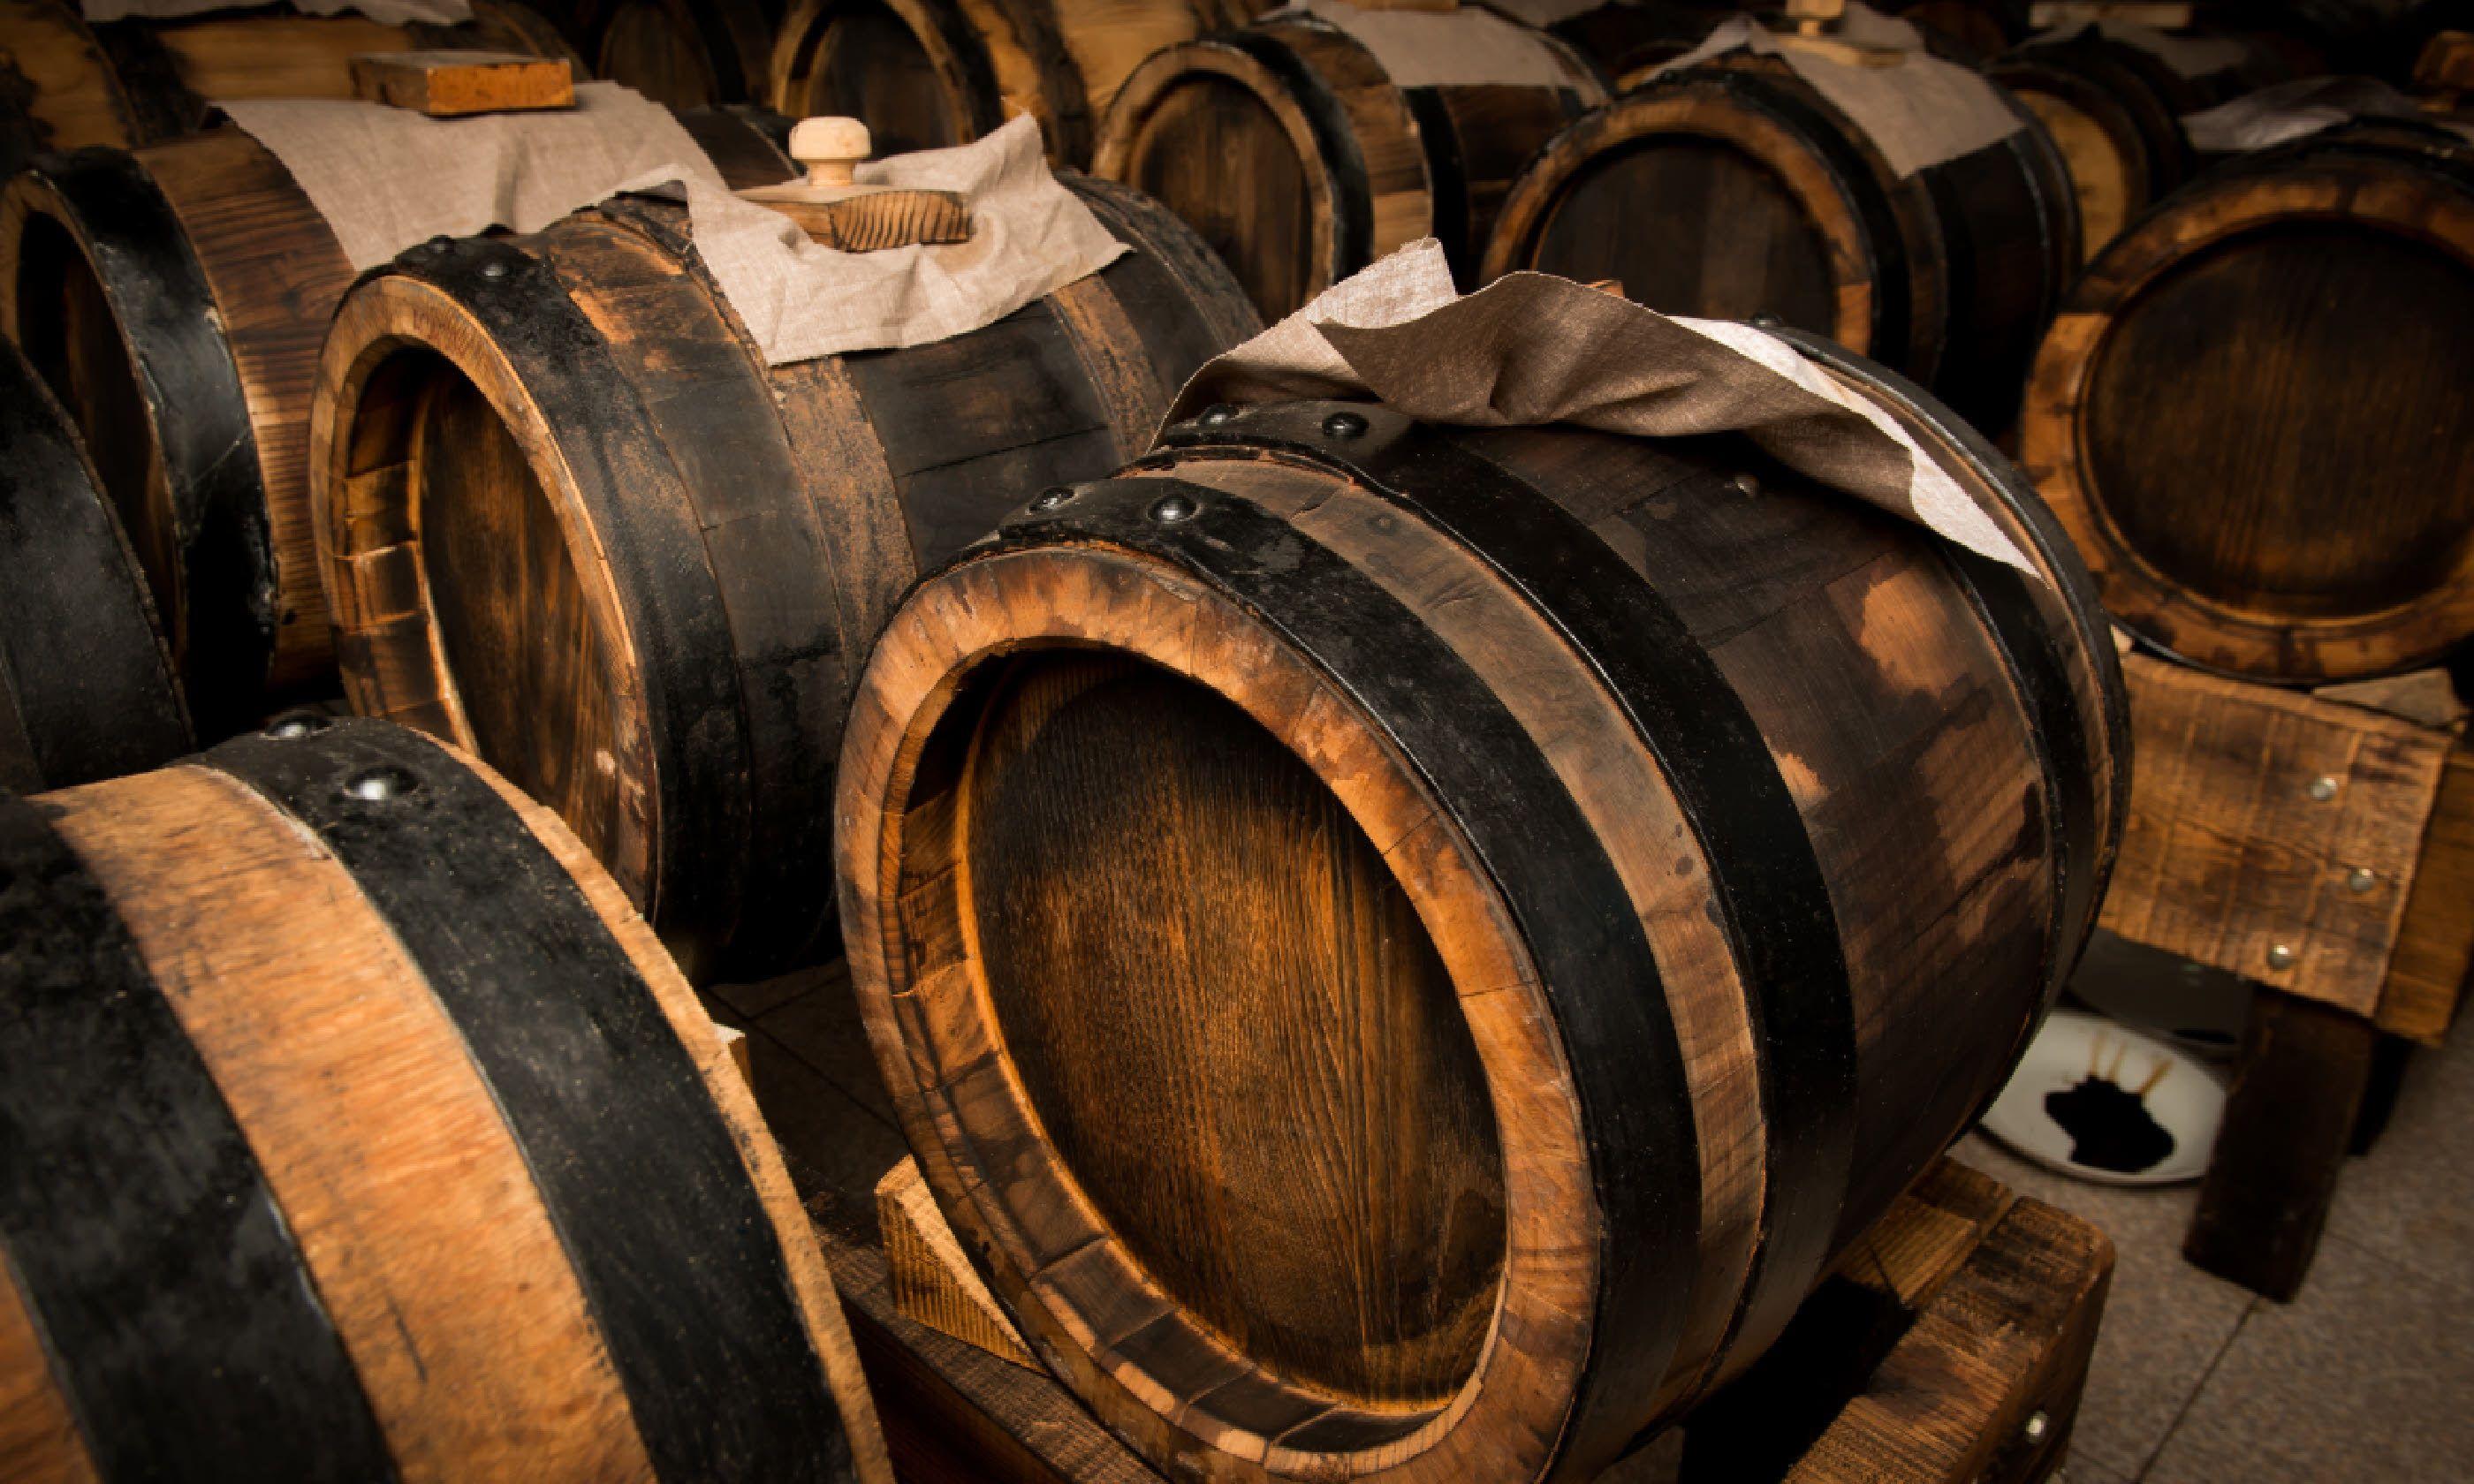 Balsamic vinegar barrels (Shutterstock)